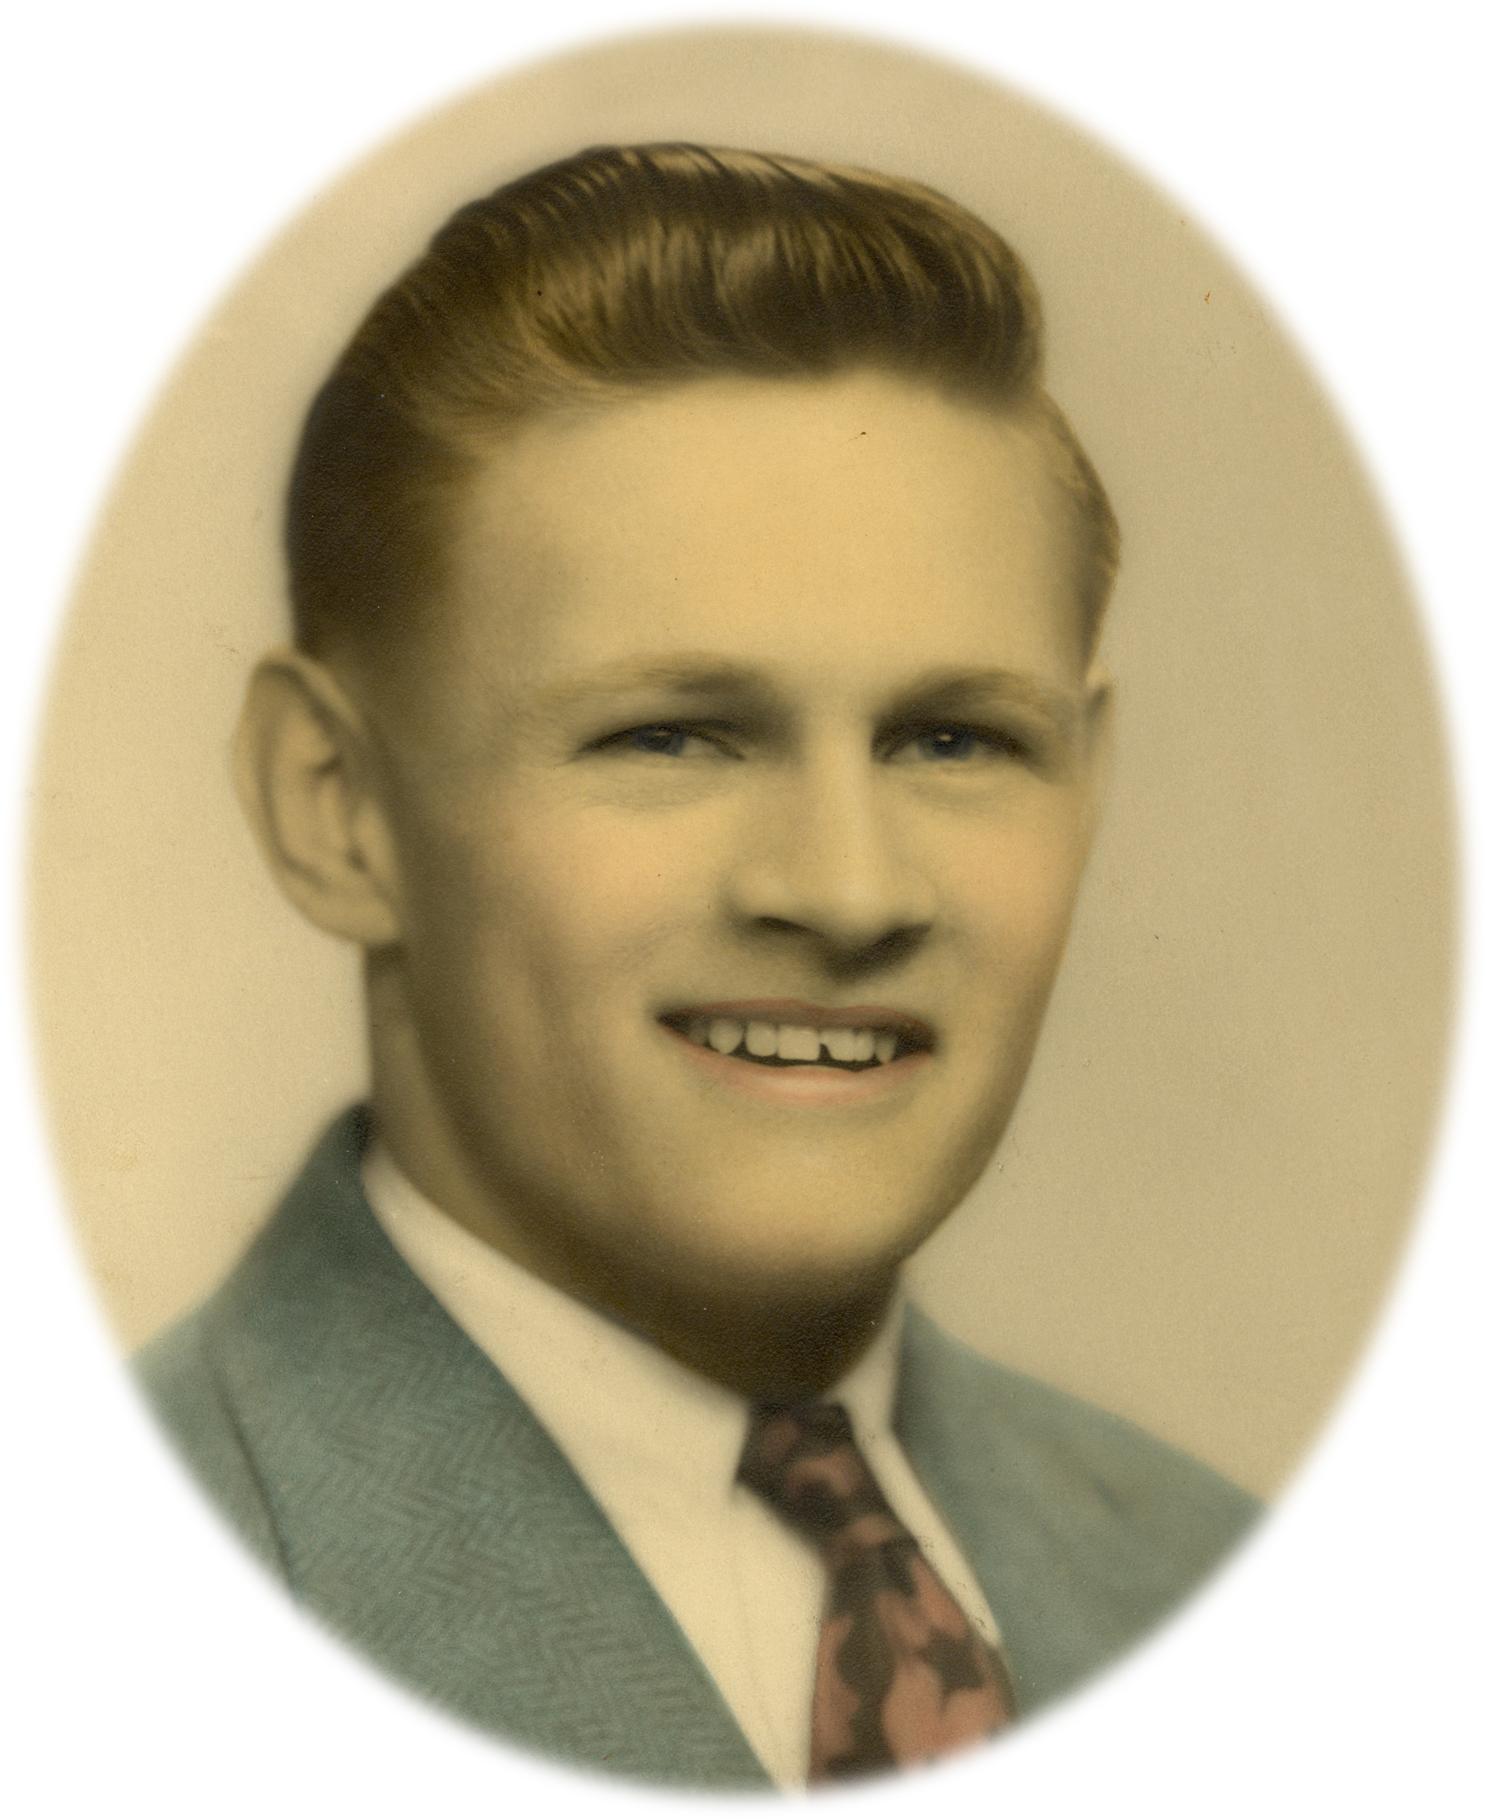 Bernard D. O'Doherty